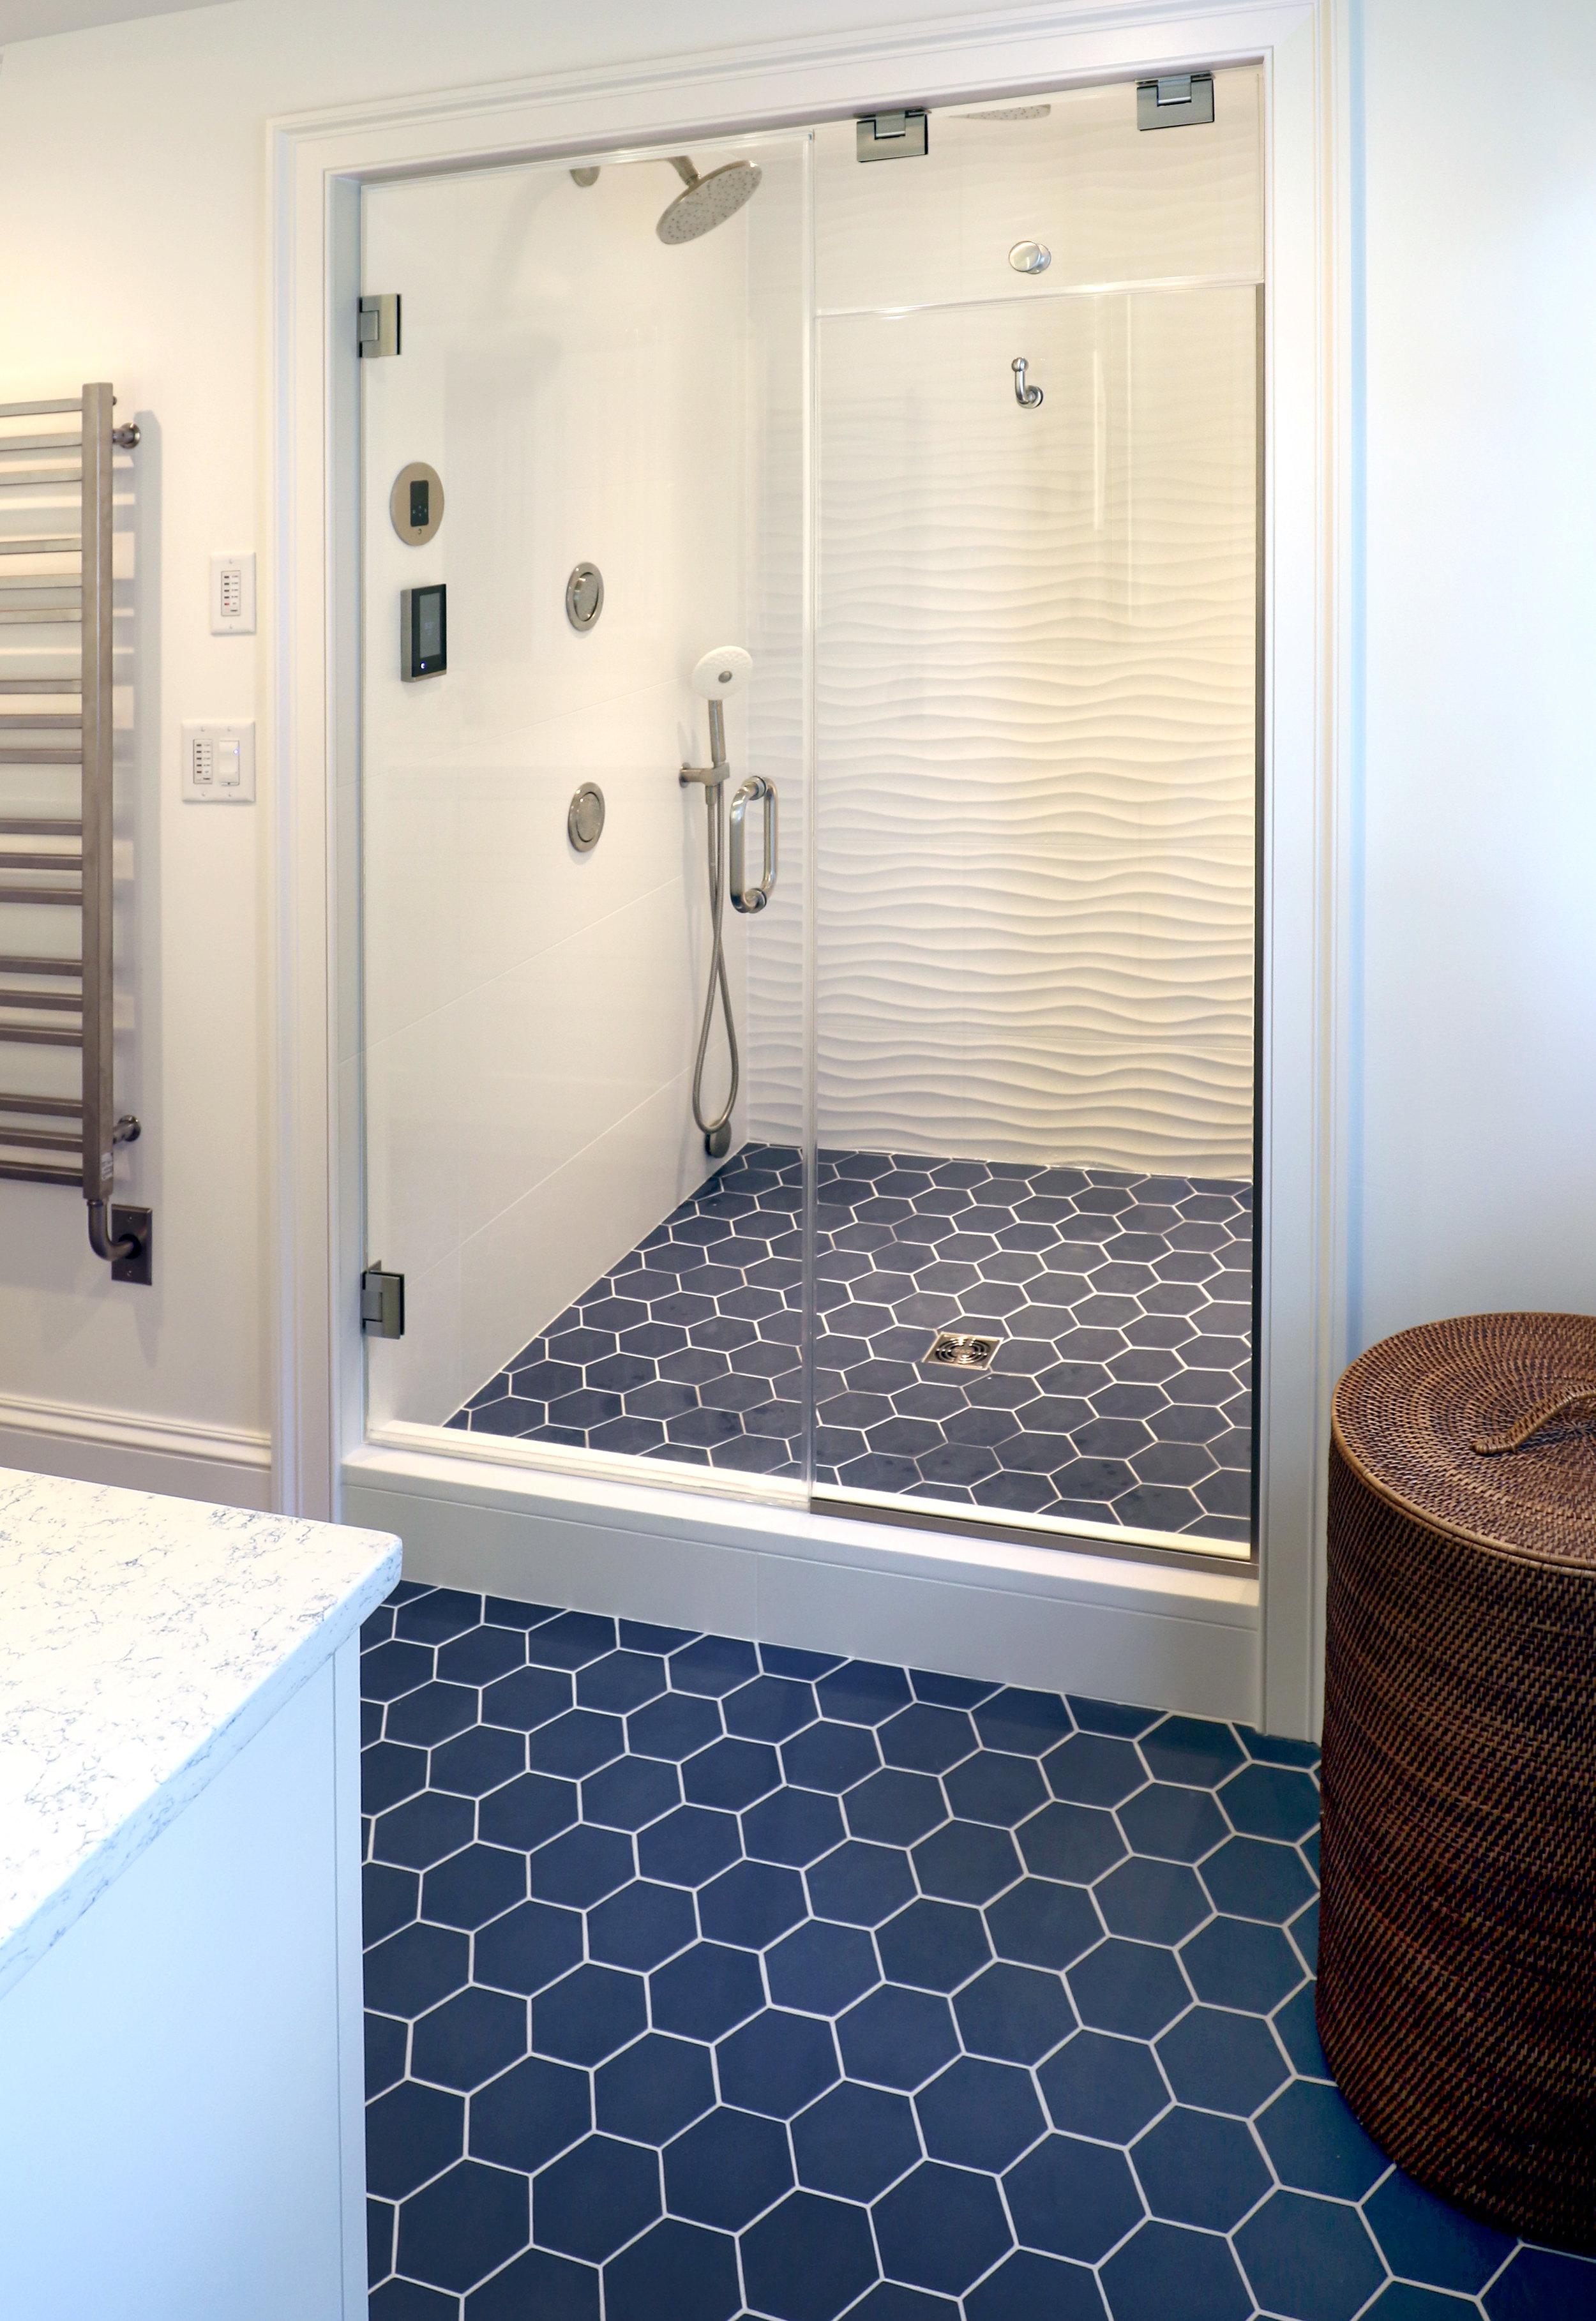 PR- Pratt & Larson - 5 inch Hexagon C340 - Ceramic - Bathroom.jpg